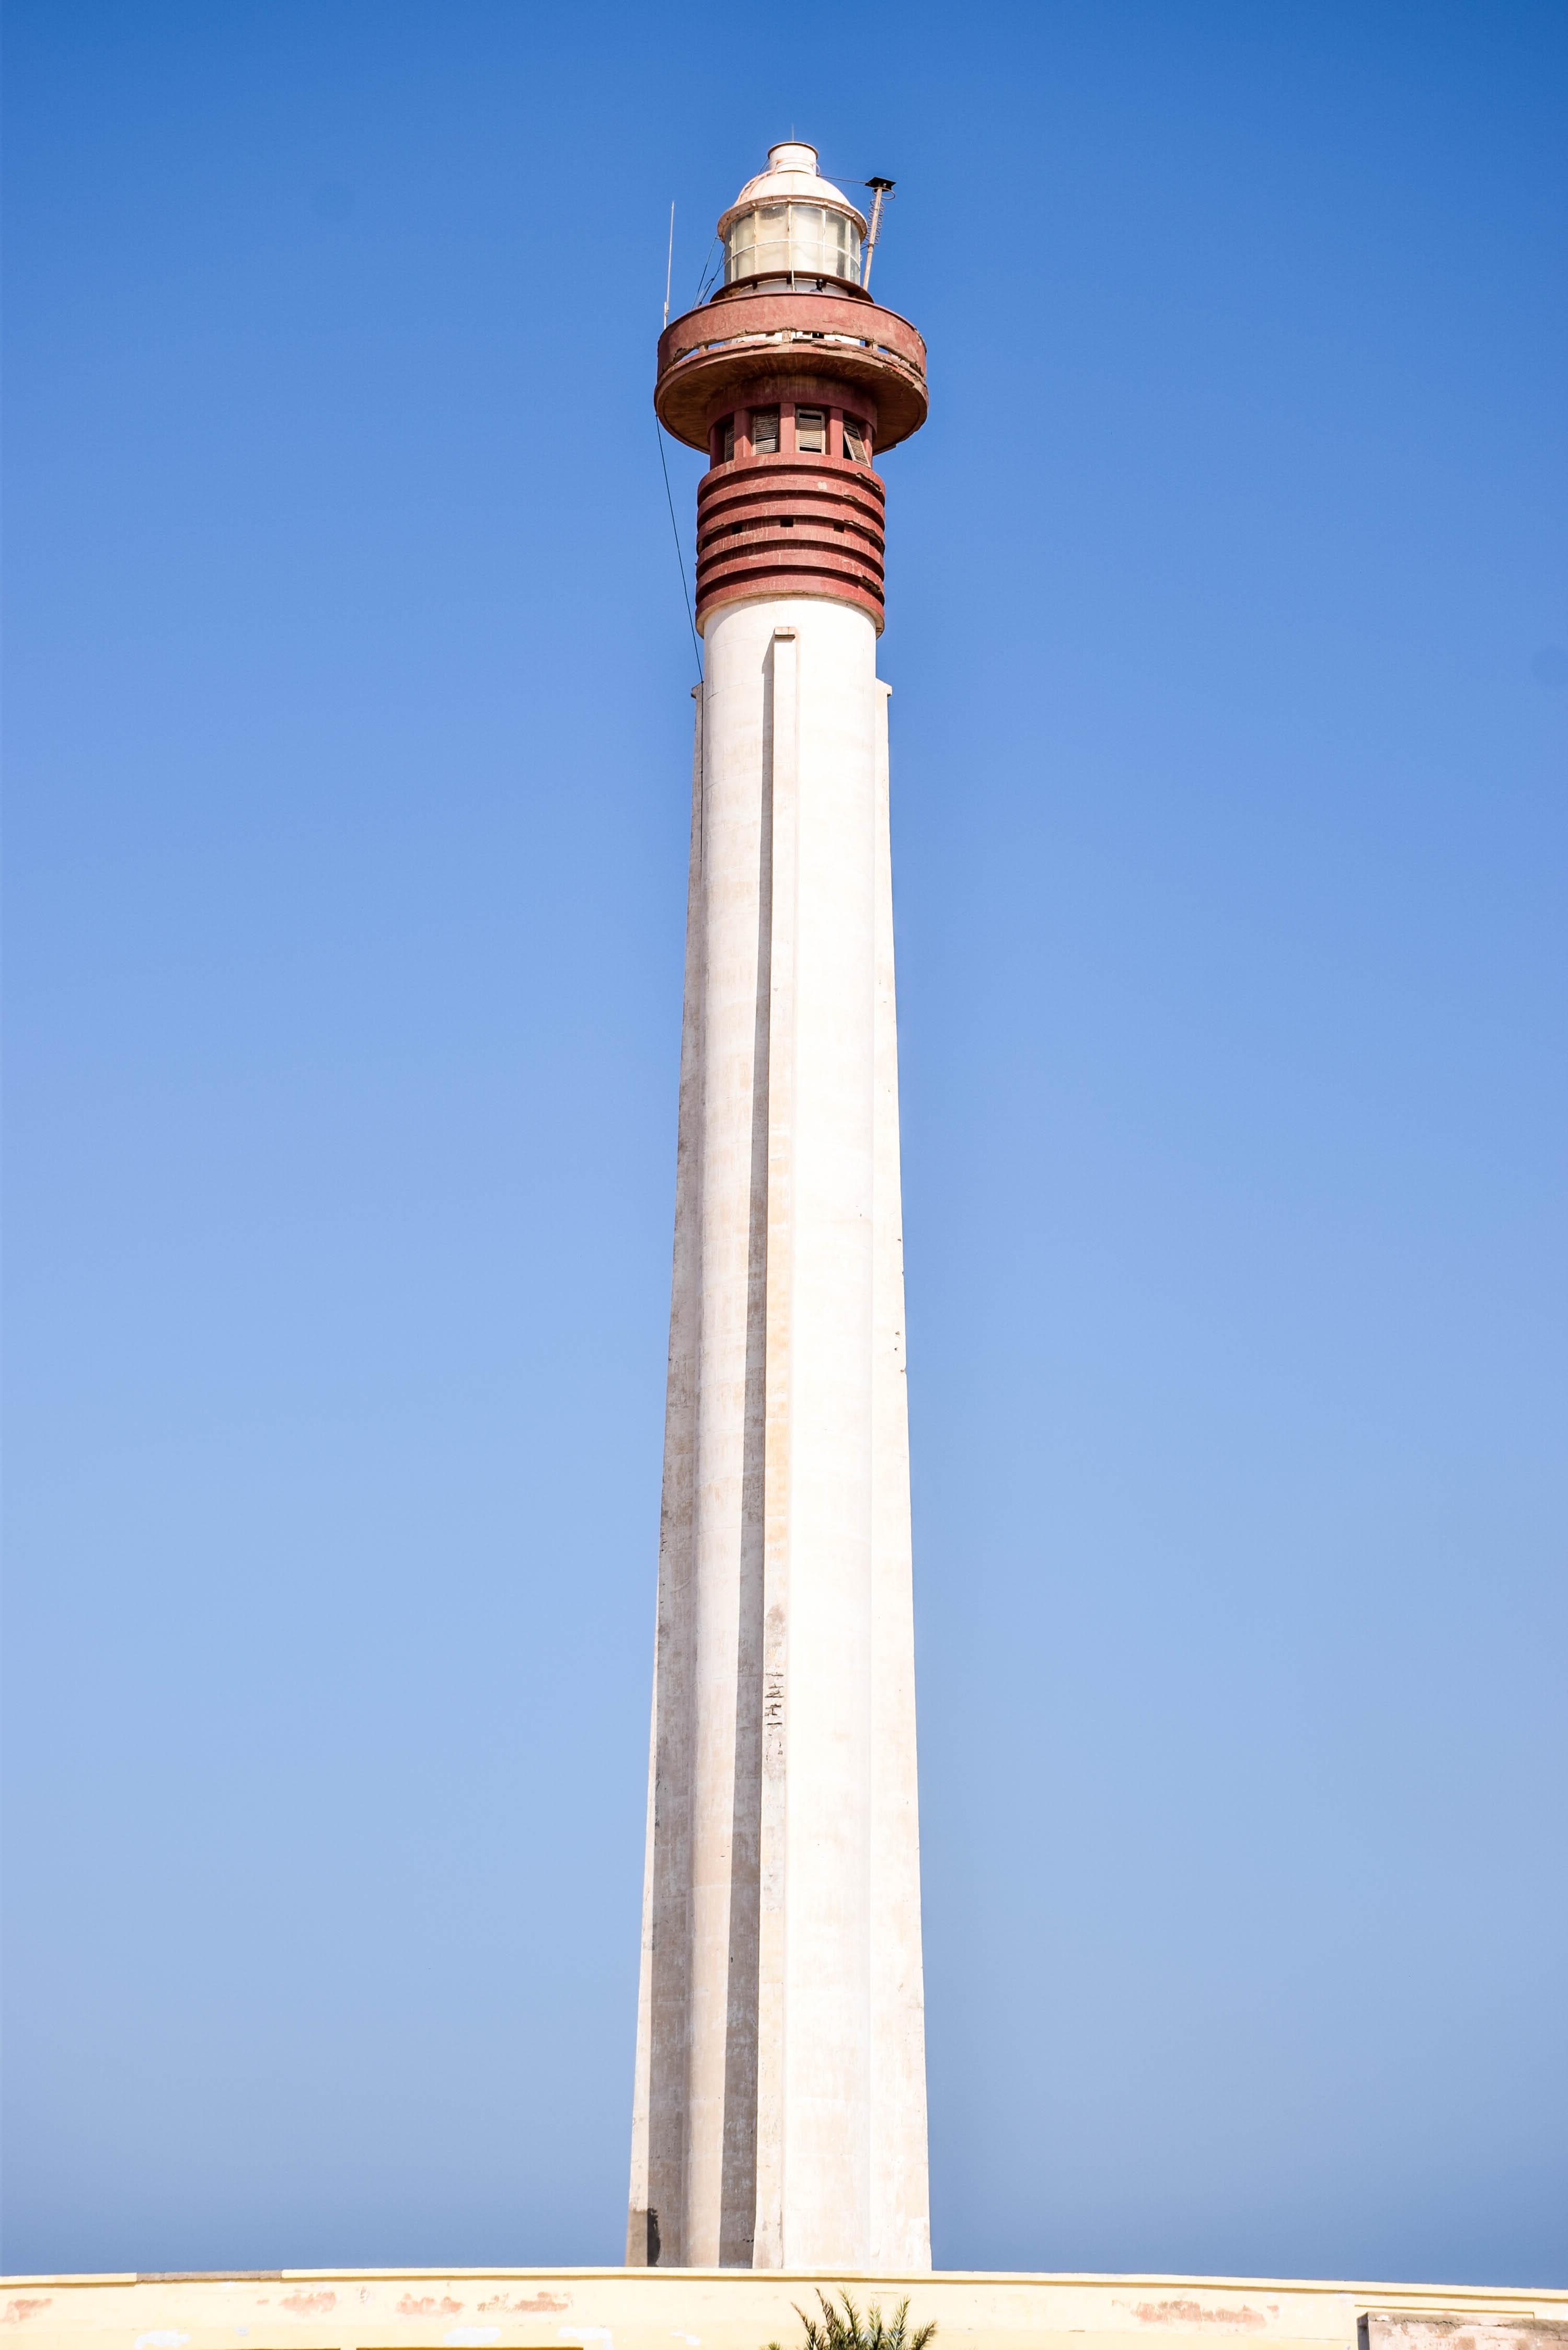 Le phare de ras bir office national du tourisme djibouti - Office national du tourisme ...